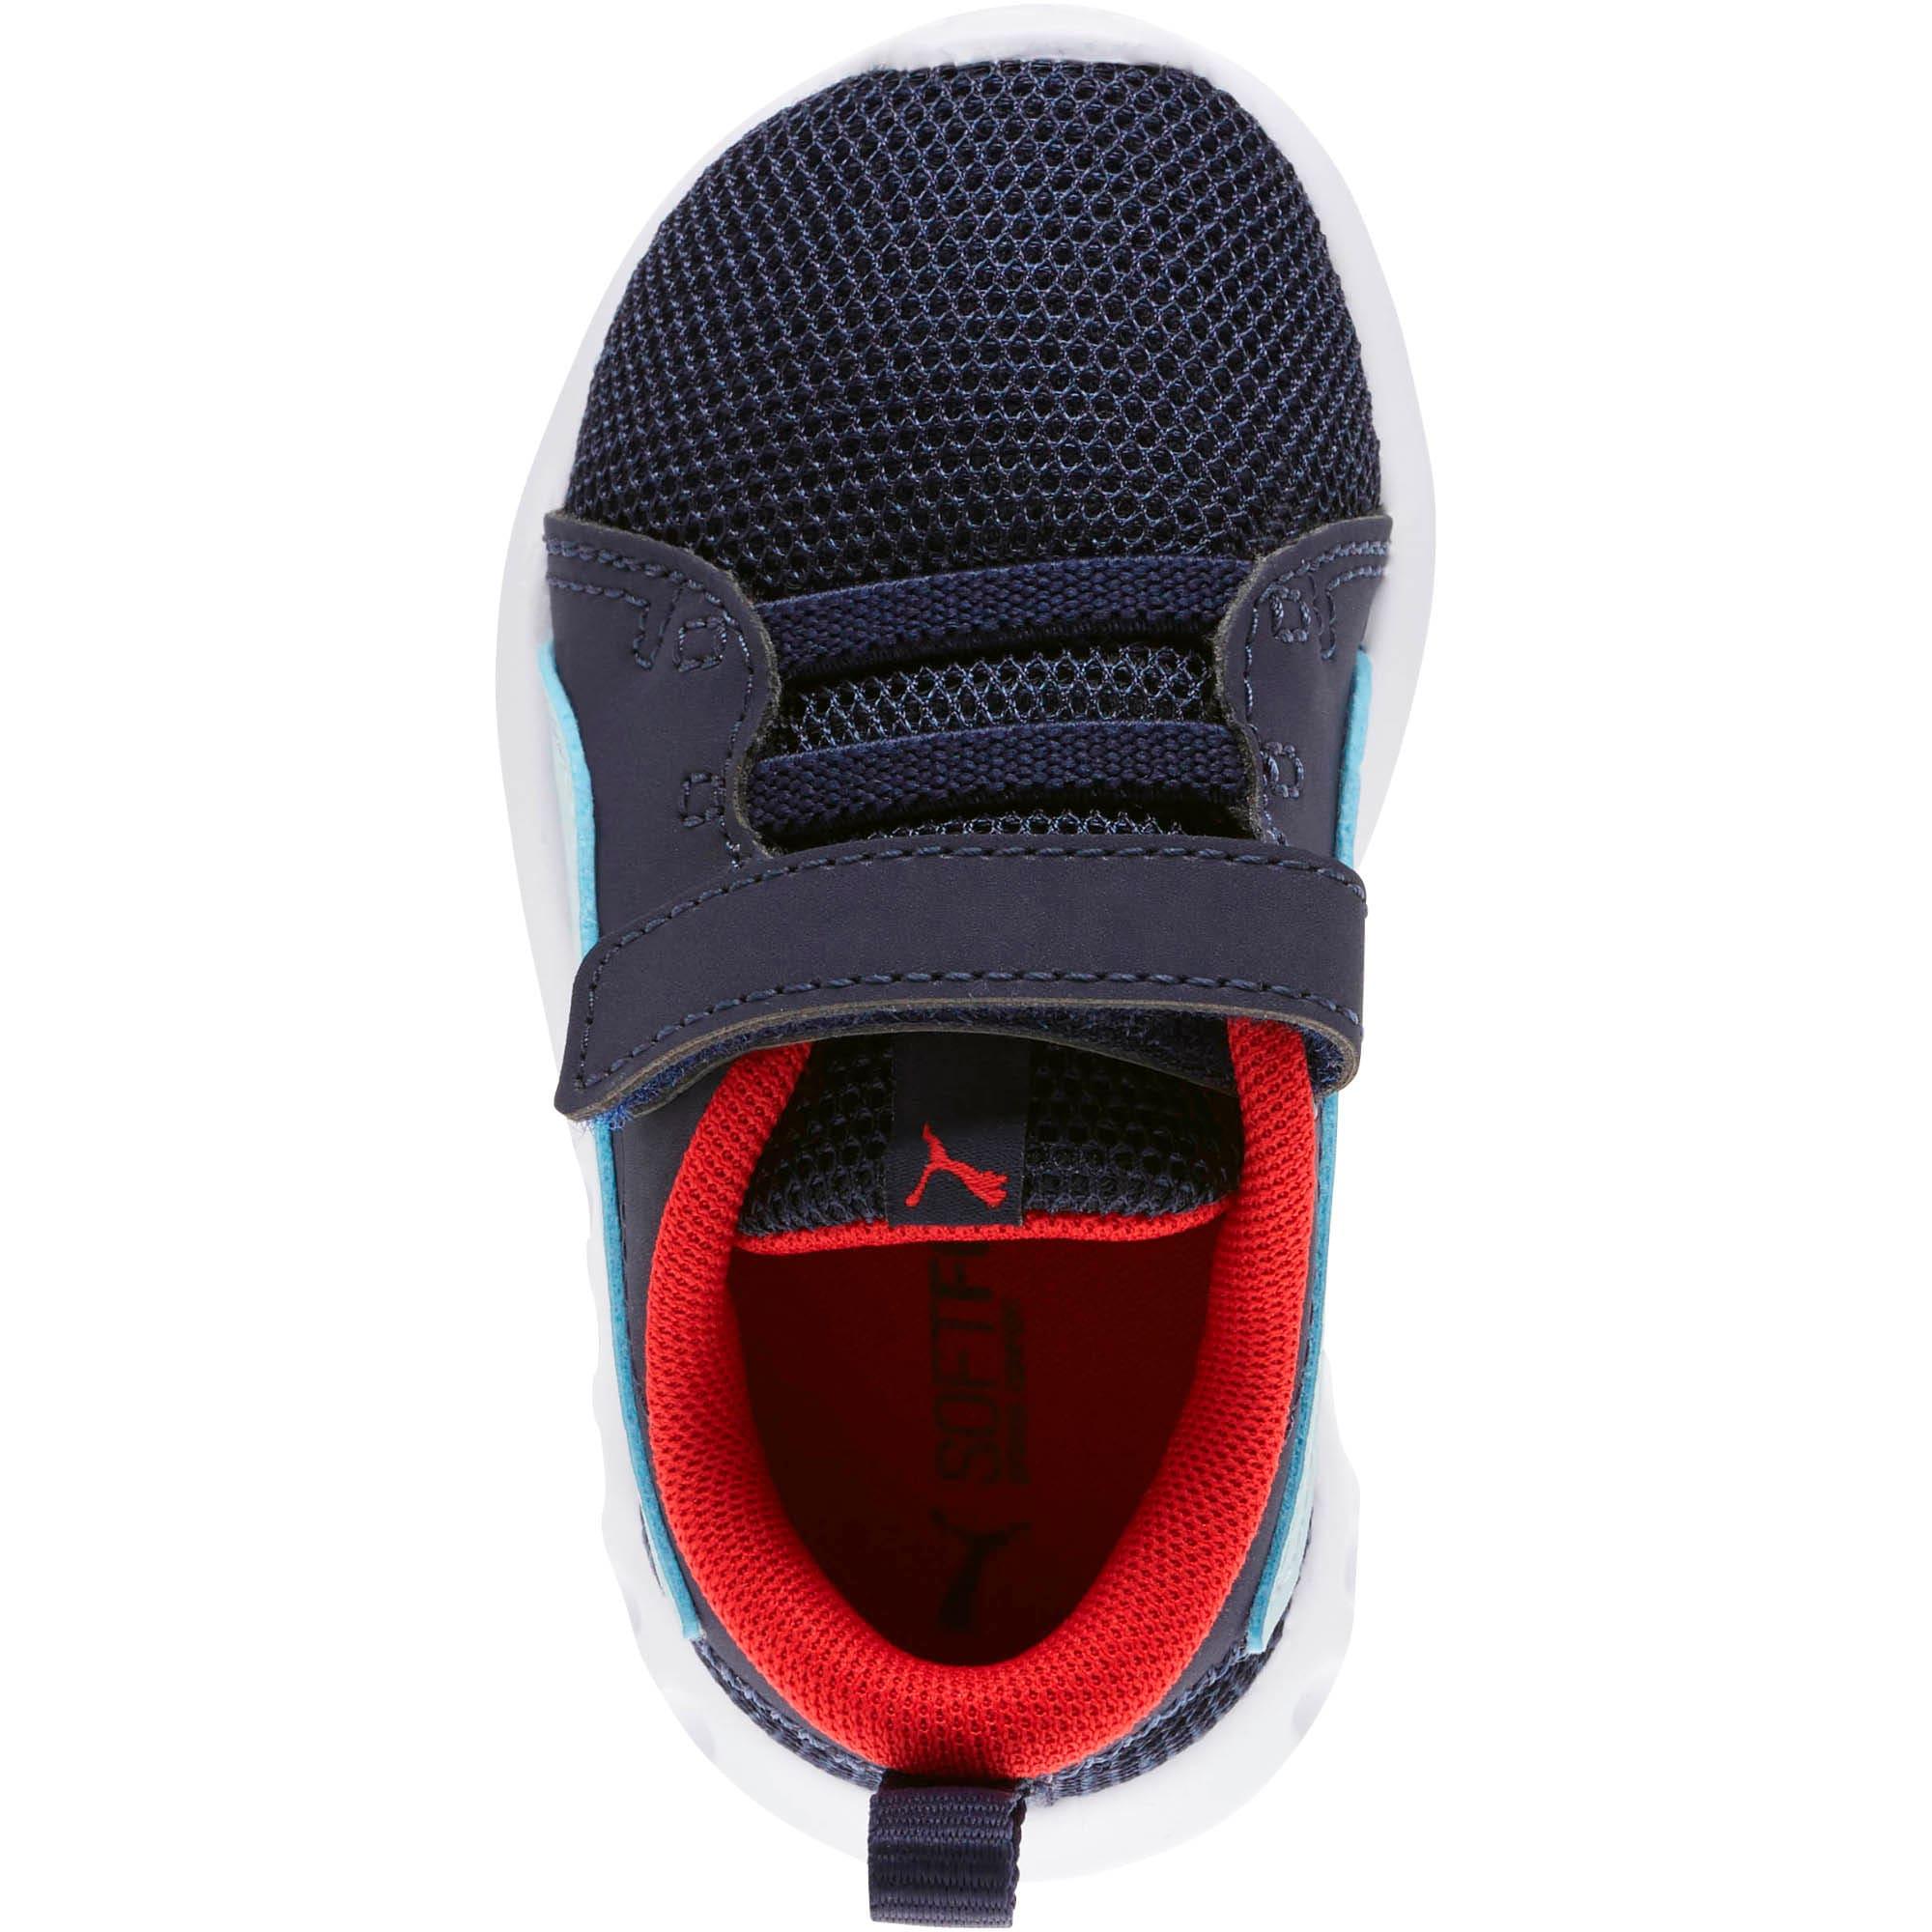 Miniatura 5 de Zapatos Carson2 Casual para bebés, Peacoat-Light Sky-Red, mediano